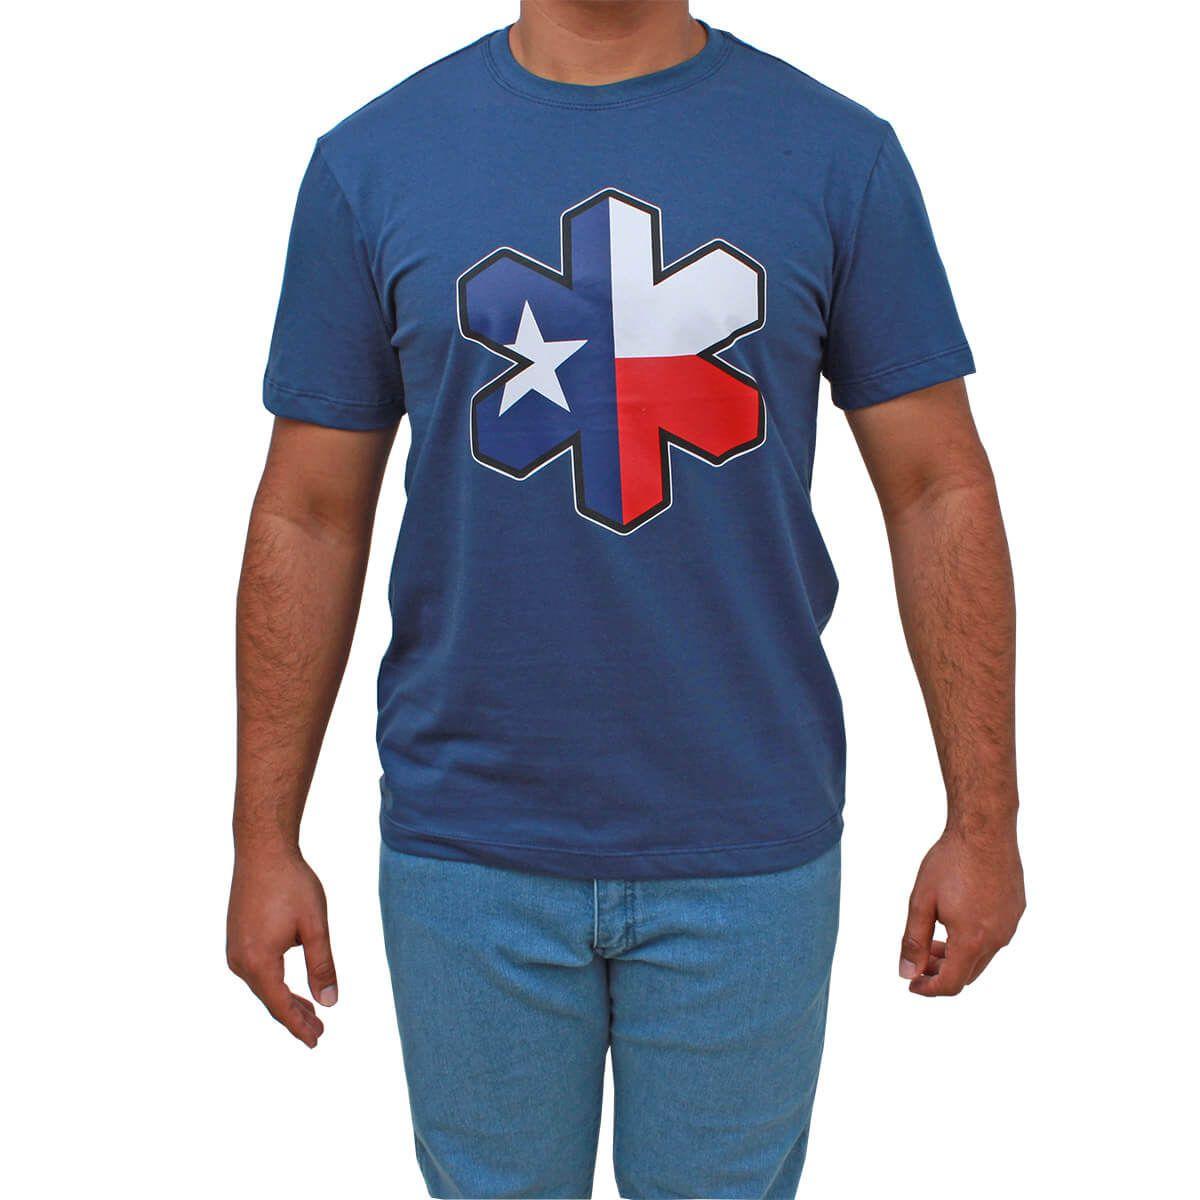 Camiseta Tuff Masculina Azul Marinho Com Logo Texas